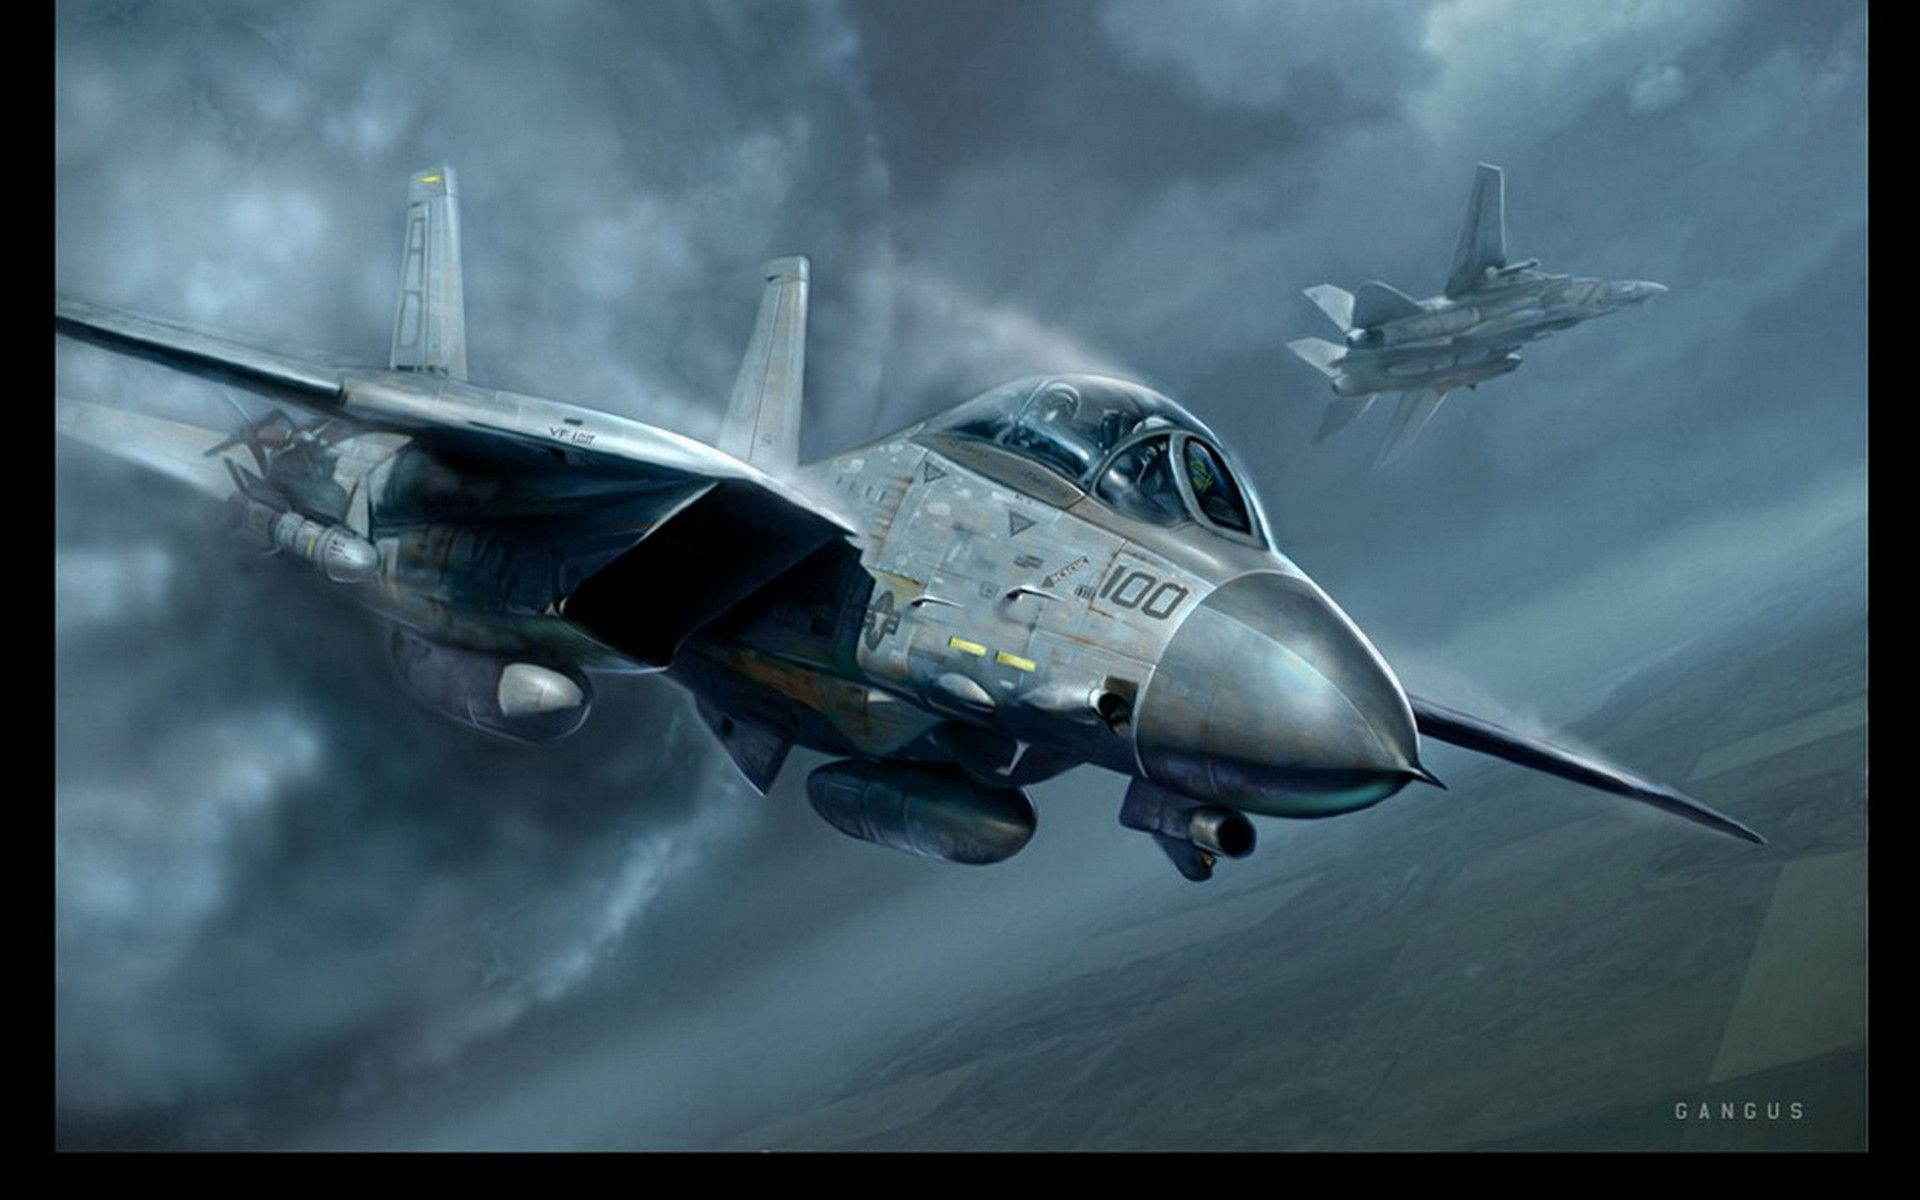 Grumman F14 Tomcat 262081 Airplane Art Aircraft Art Airplane Fighter